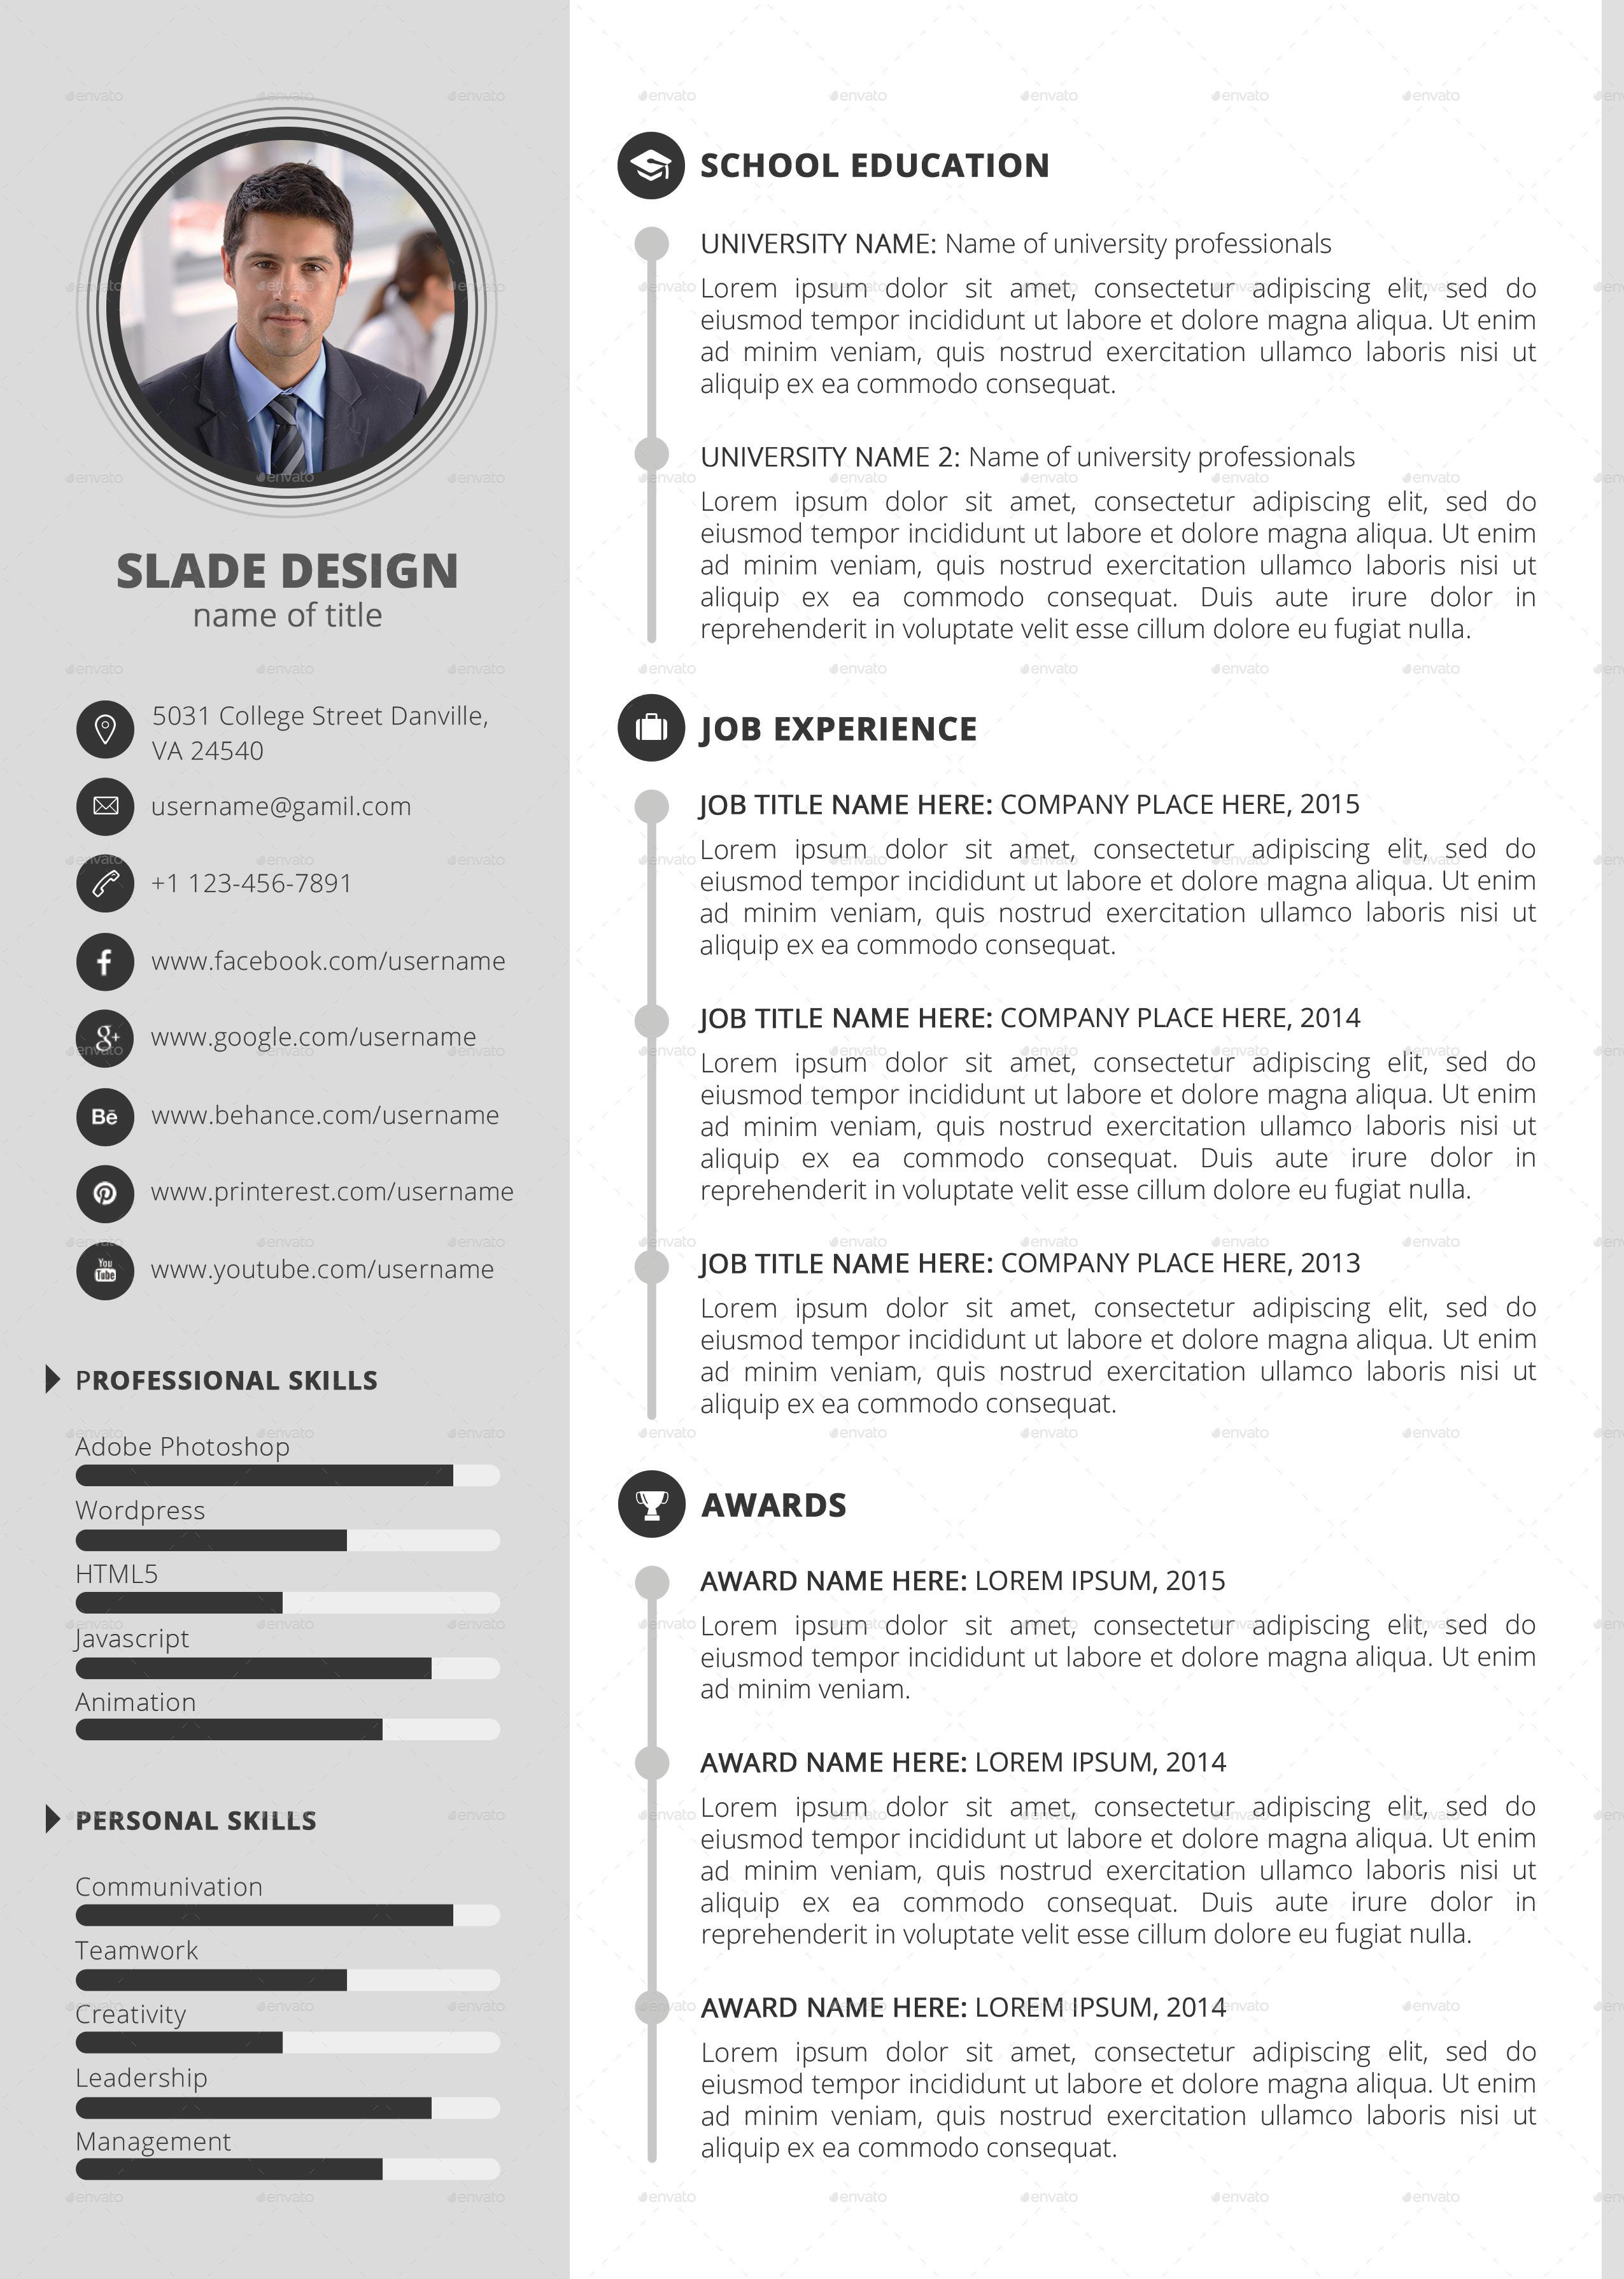 resume curriculum vitae examples acting resume template pdf german